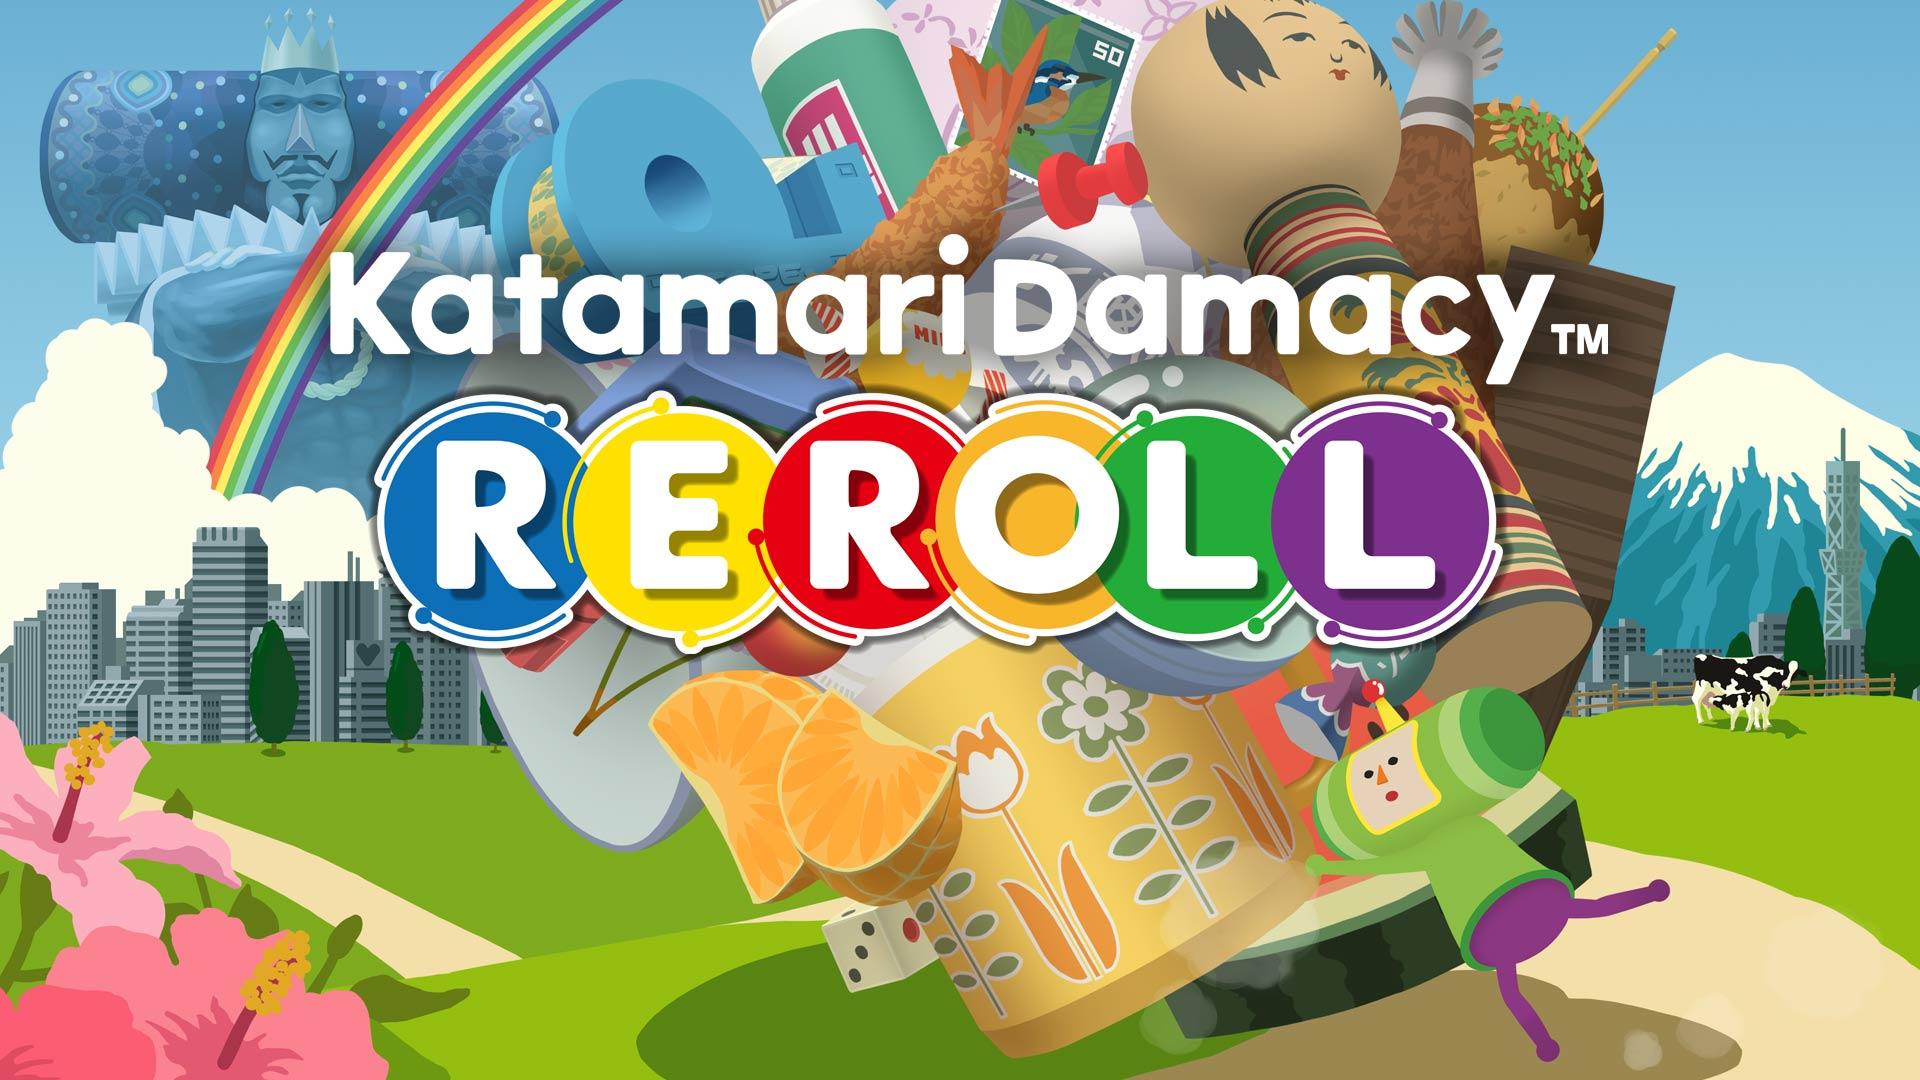 Katamari Damacy REROLL (Nintentdo Switch Digital Download) for $7.49 @ Nintendo eShop